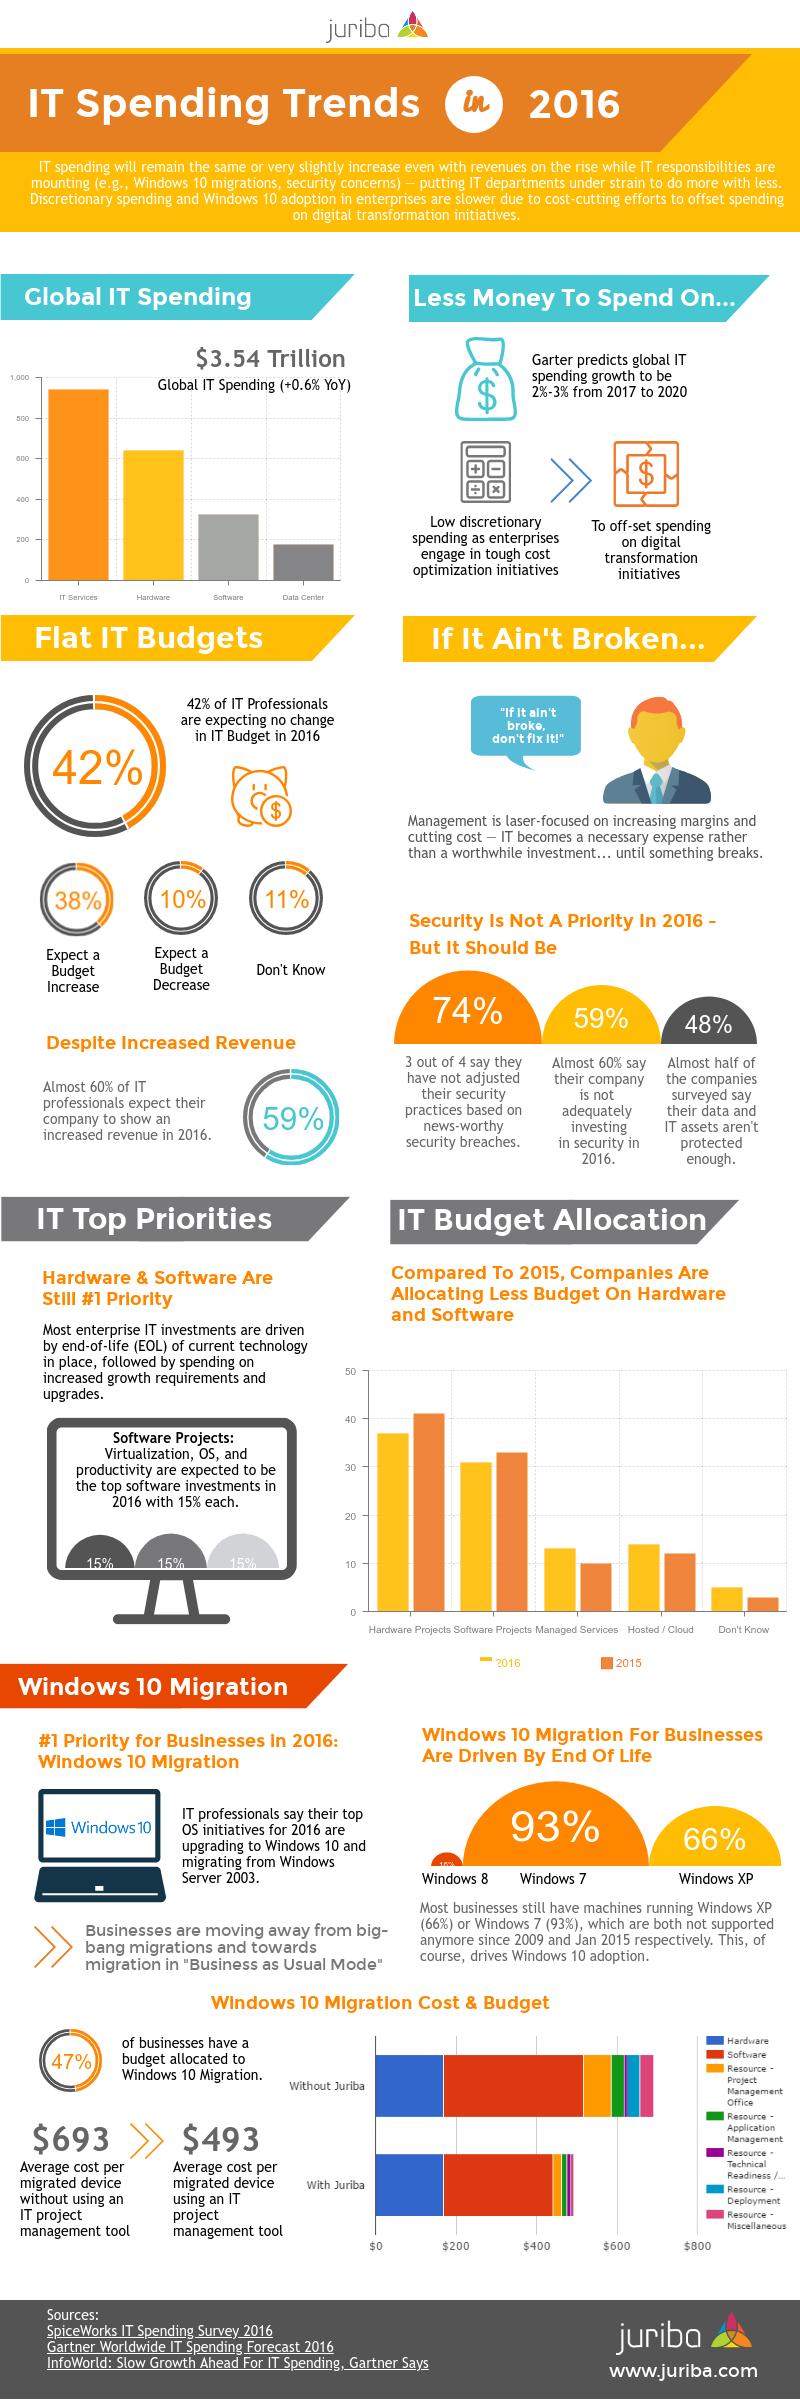 IT-Spending-2016